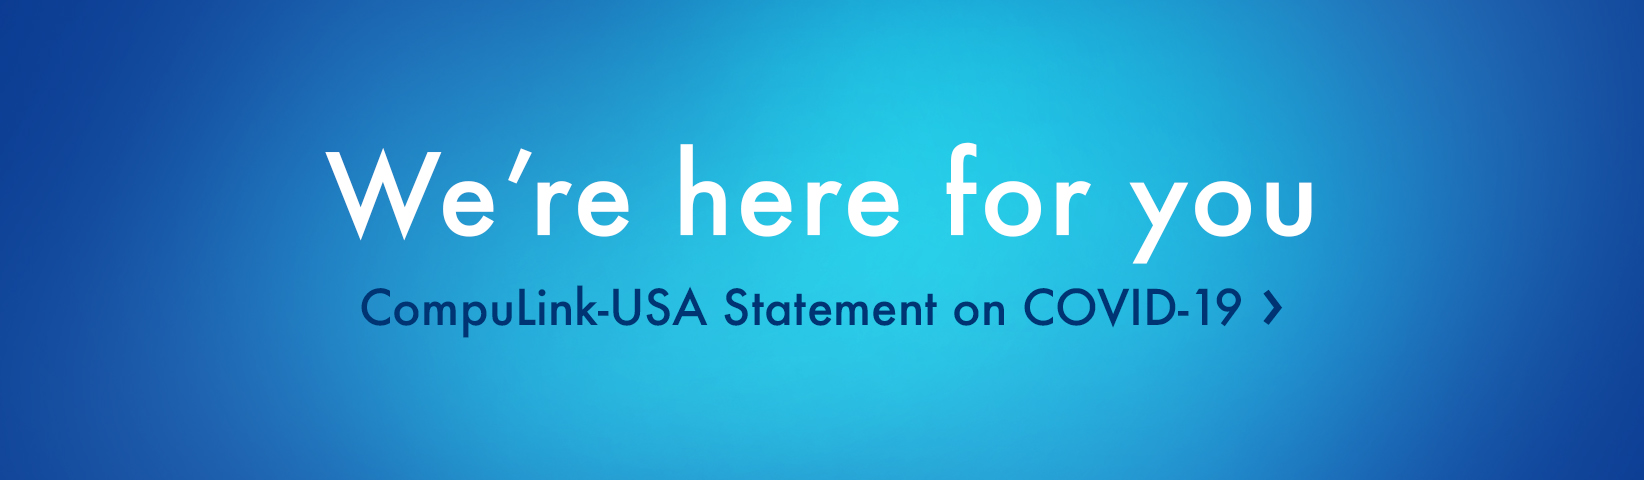 CompuLink-USA Statement on COVID-19